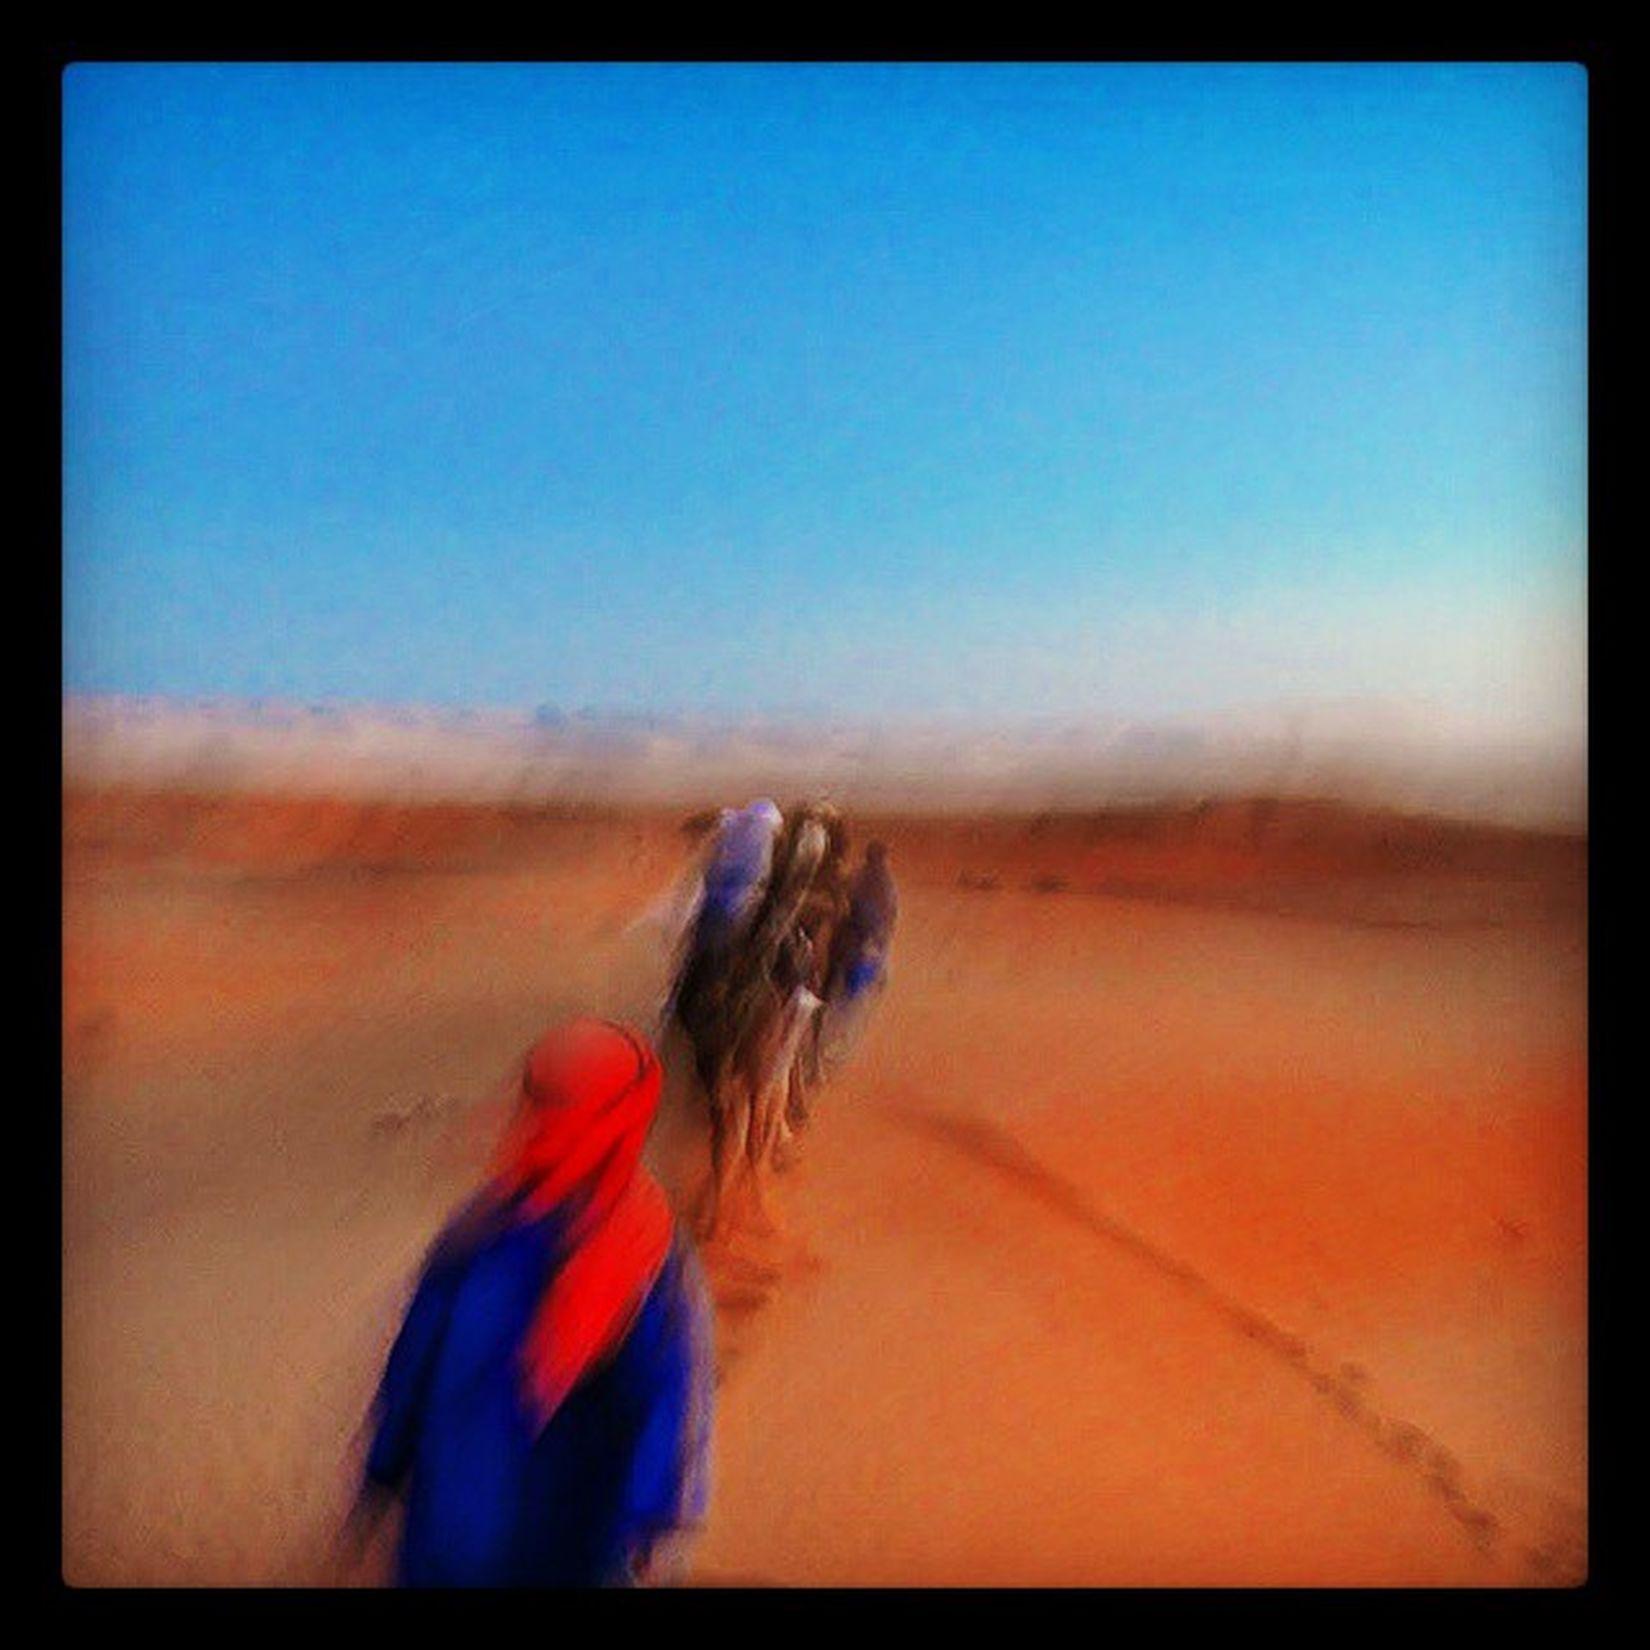 Désert Nikonfr Maroc Morocco Desert Merzouga Travel Holiday Photomed2015